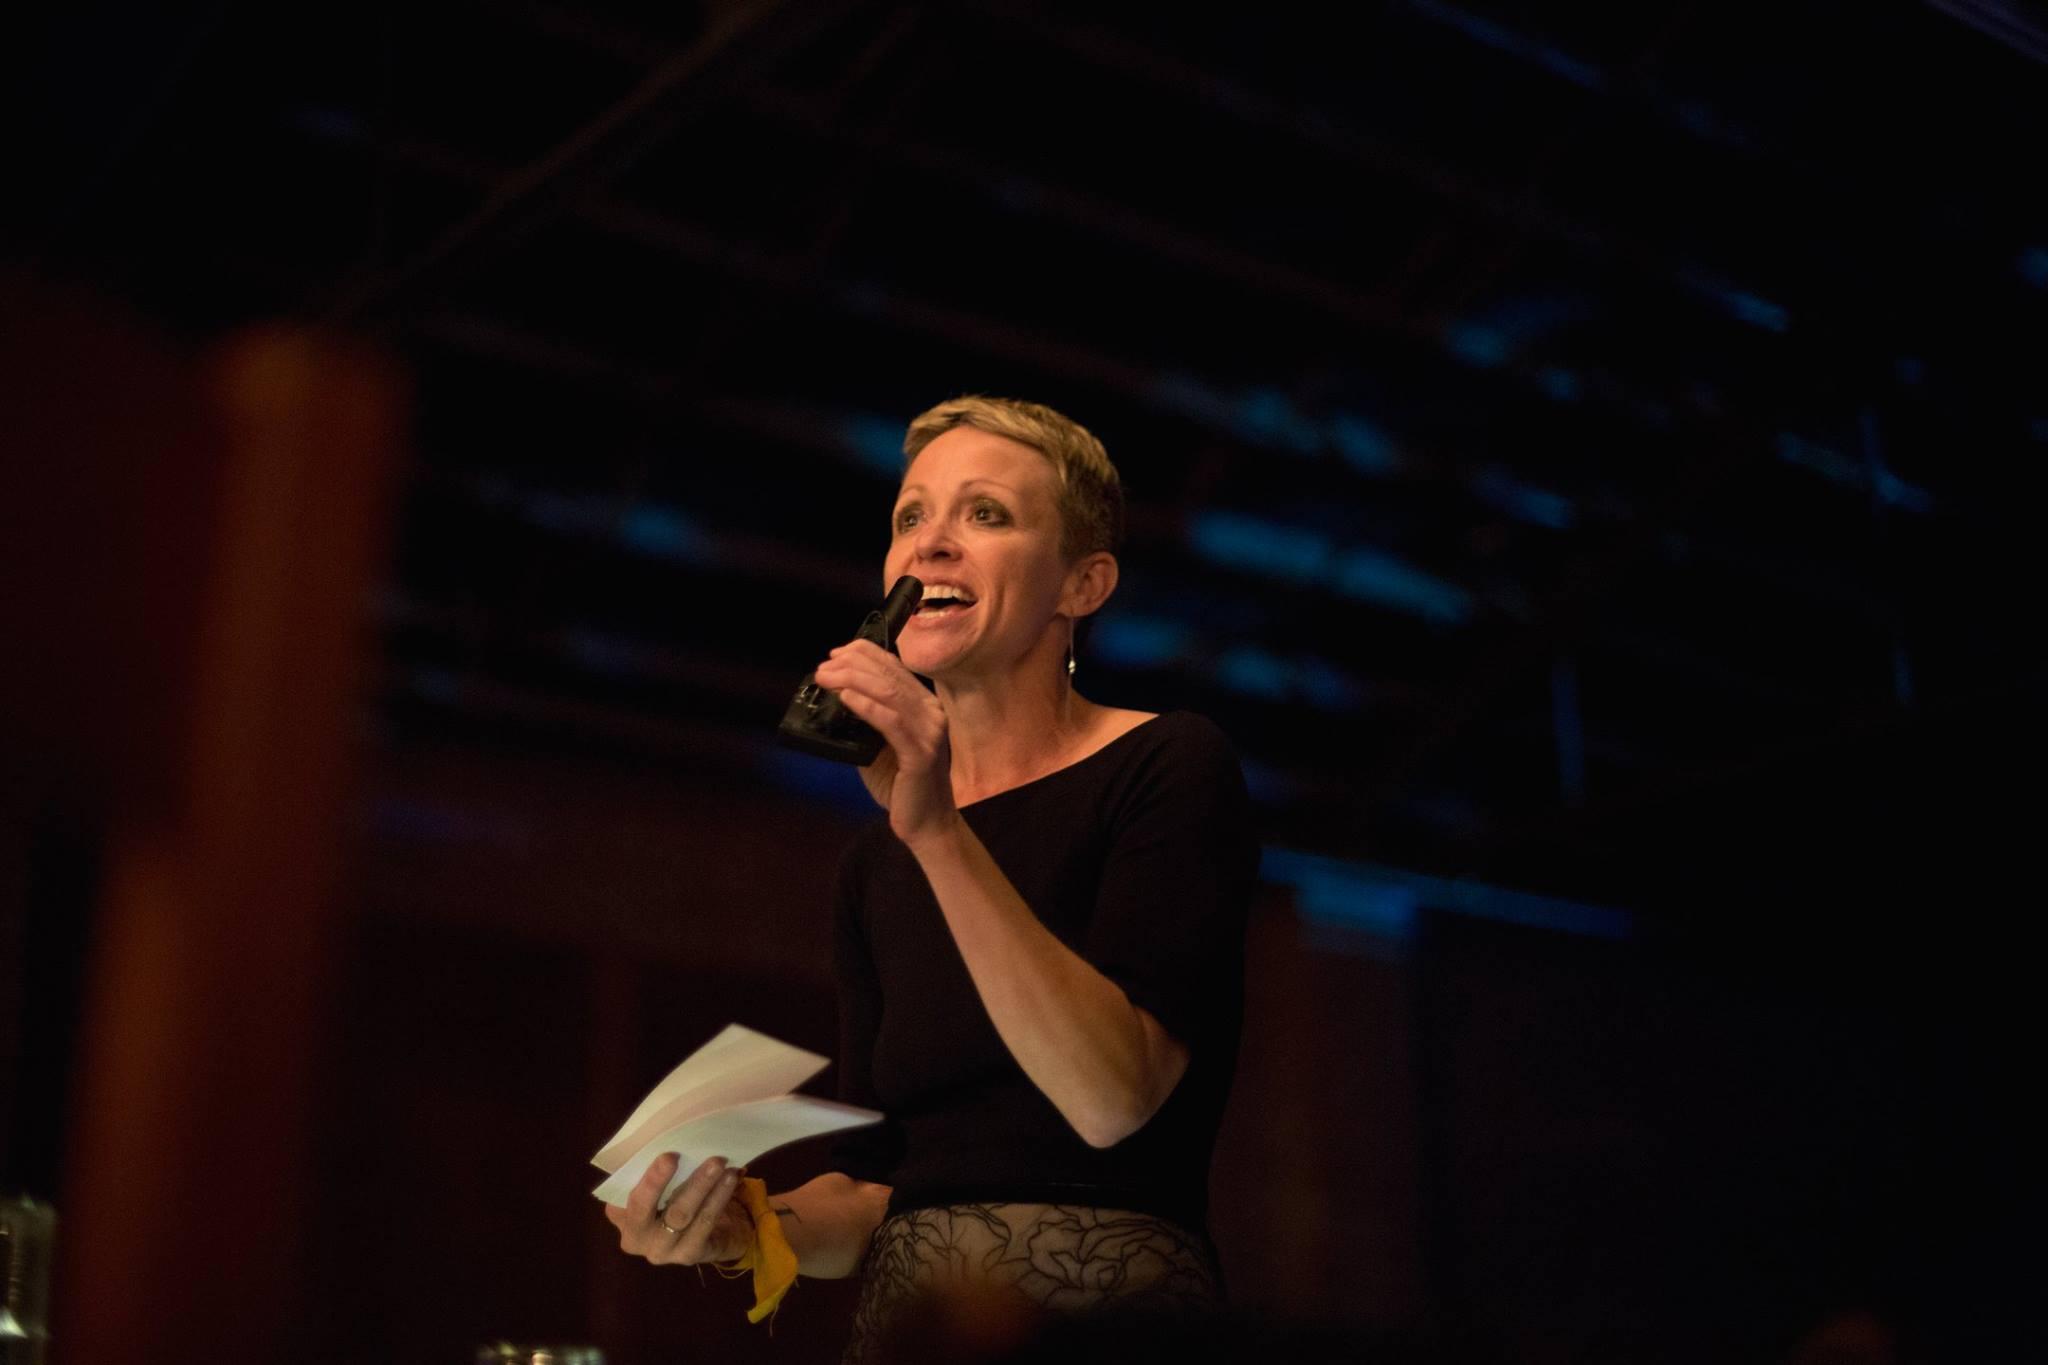 Angie LaPaglia spoken word 3.jpg